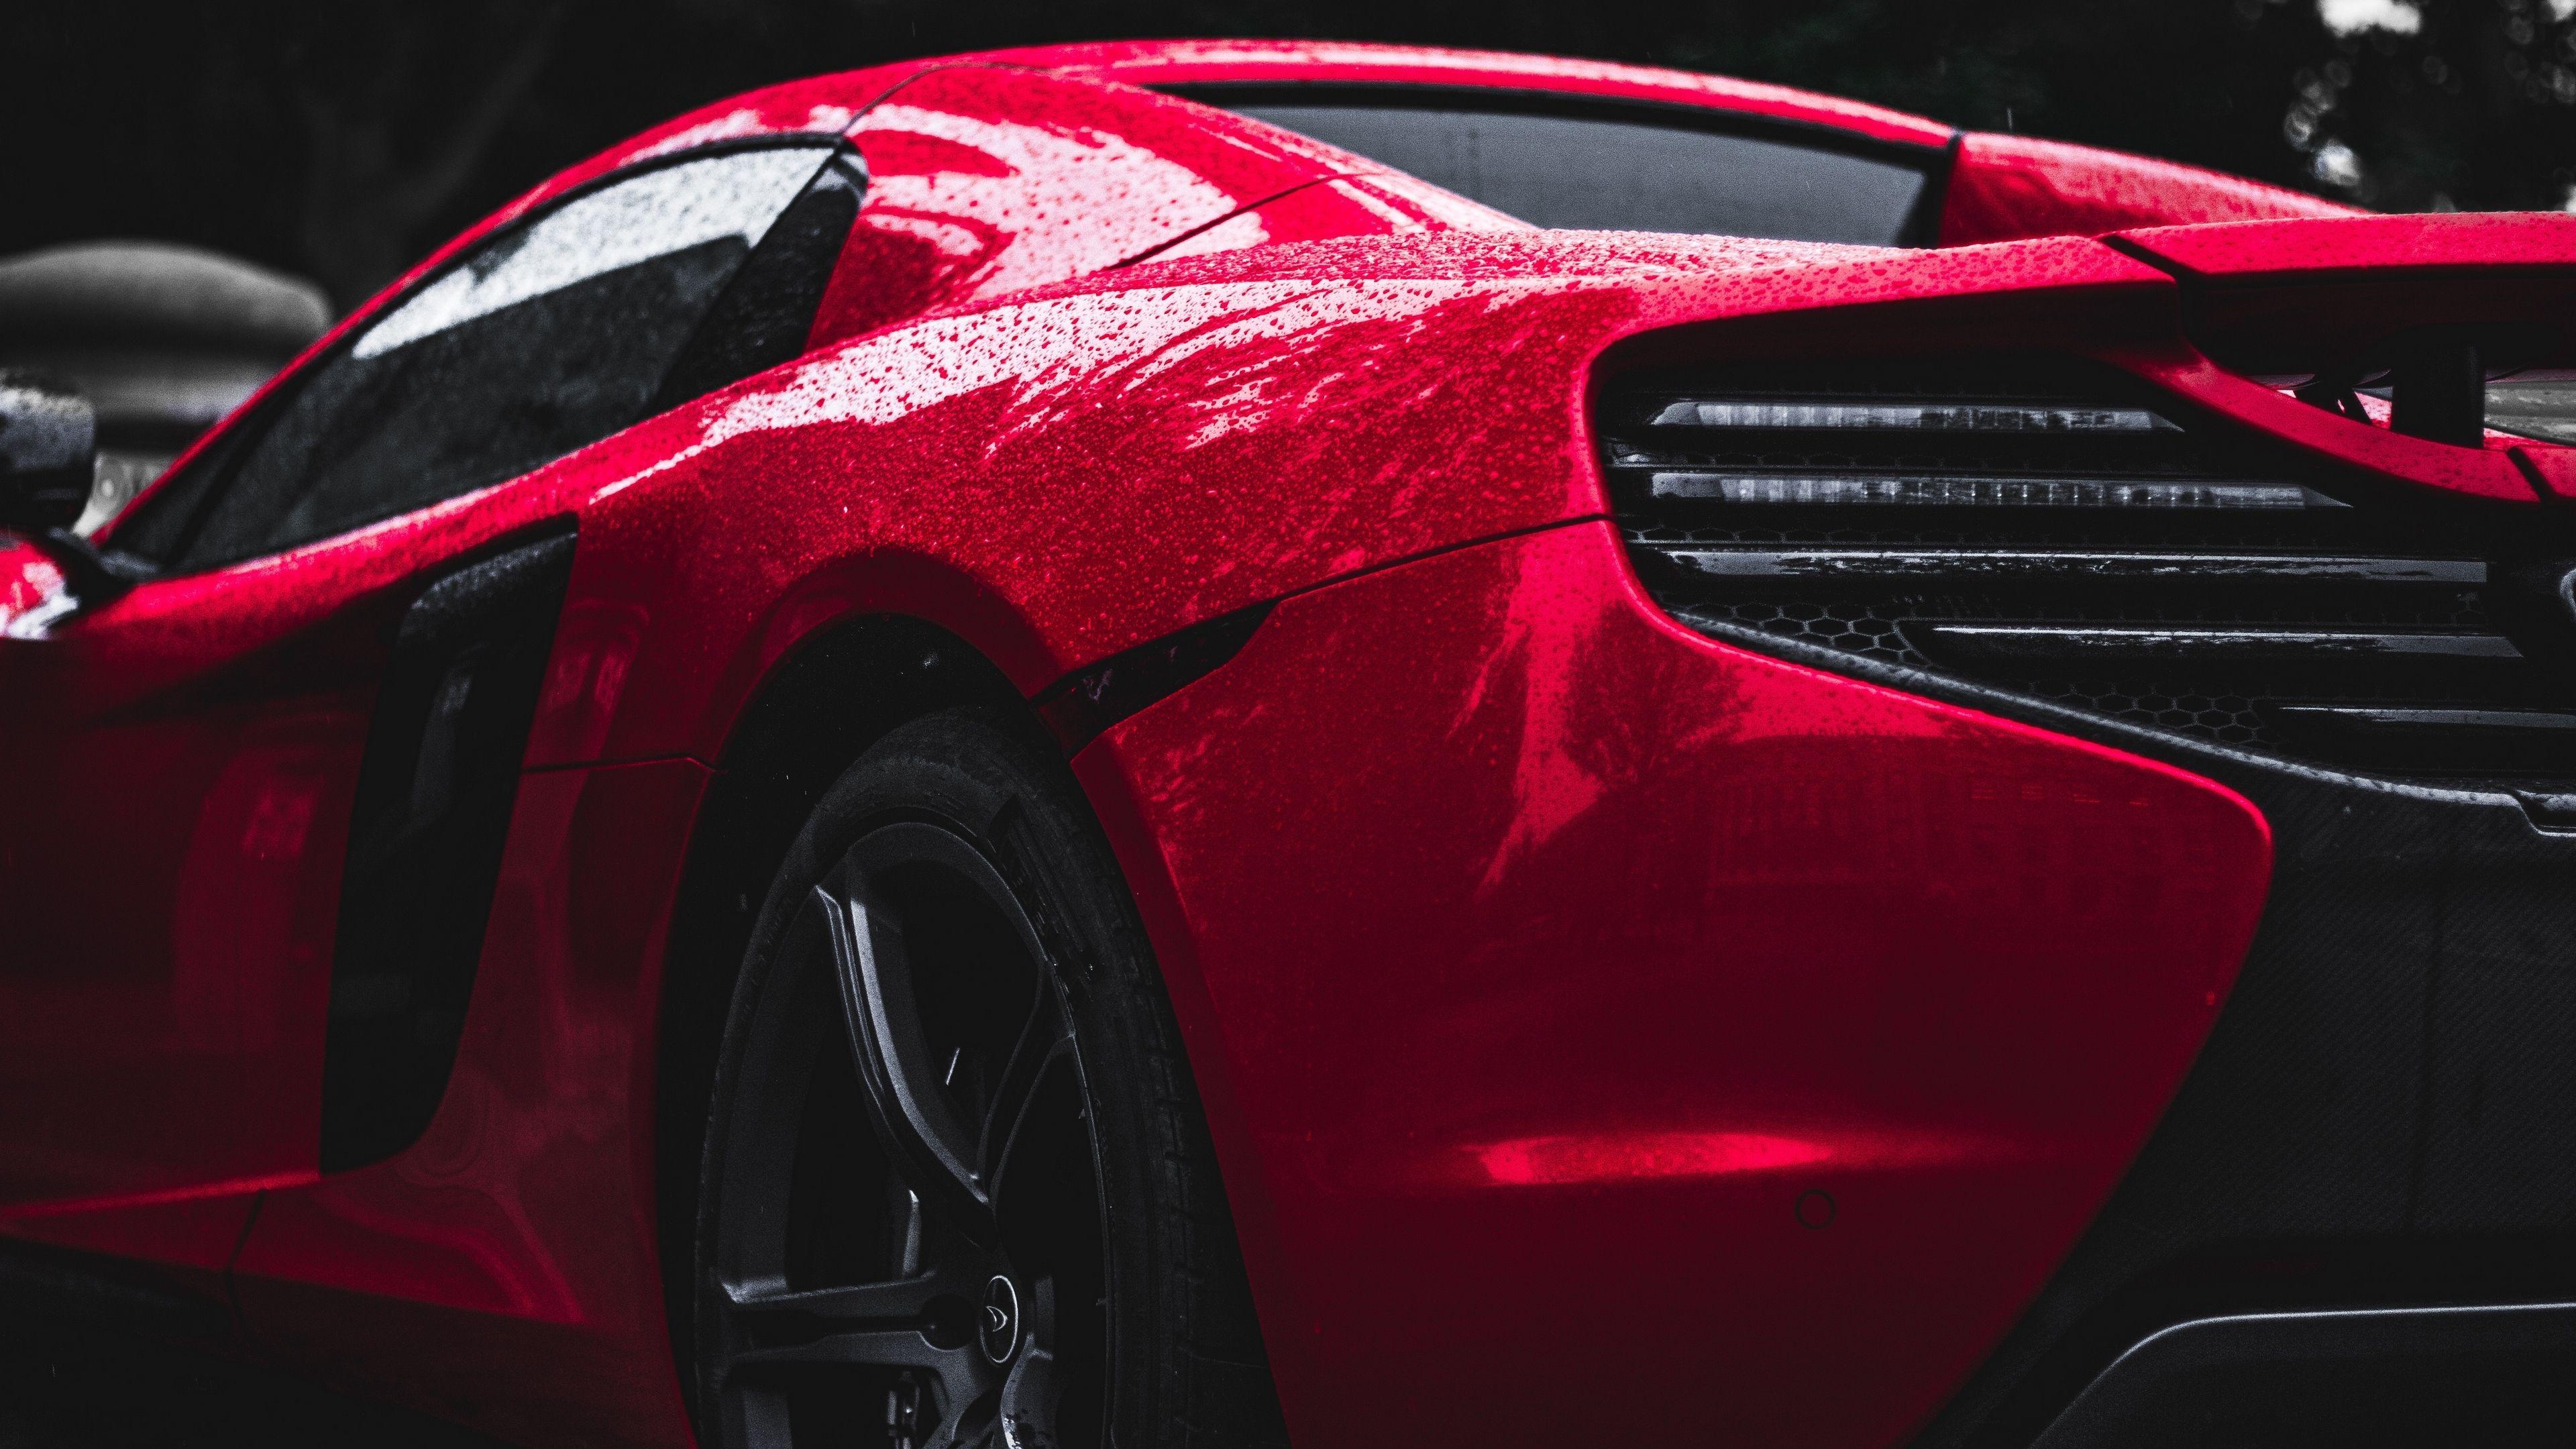 Red Mclaren Rear mclaren wallpapers, hd-wallpapers, cars wallpapers, 4k-wallpape…